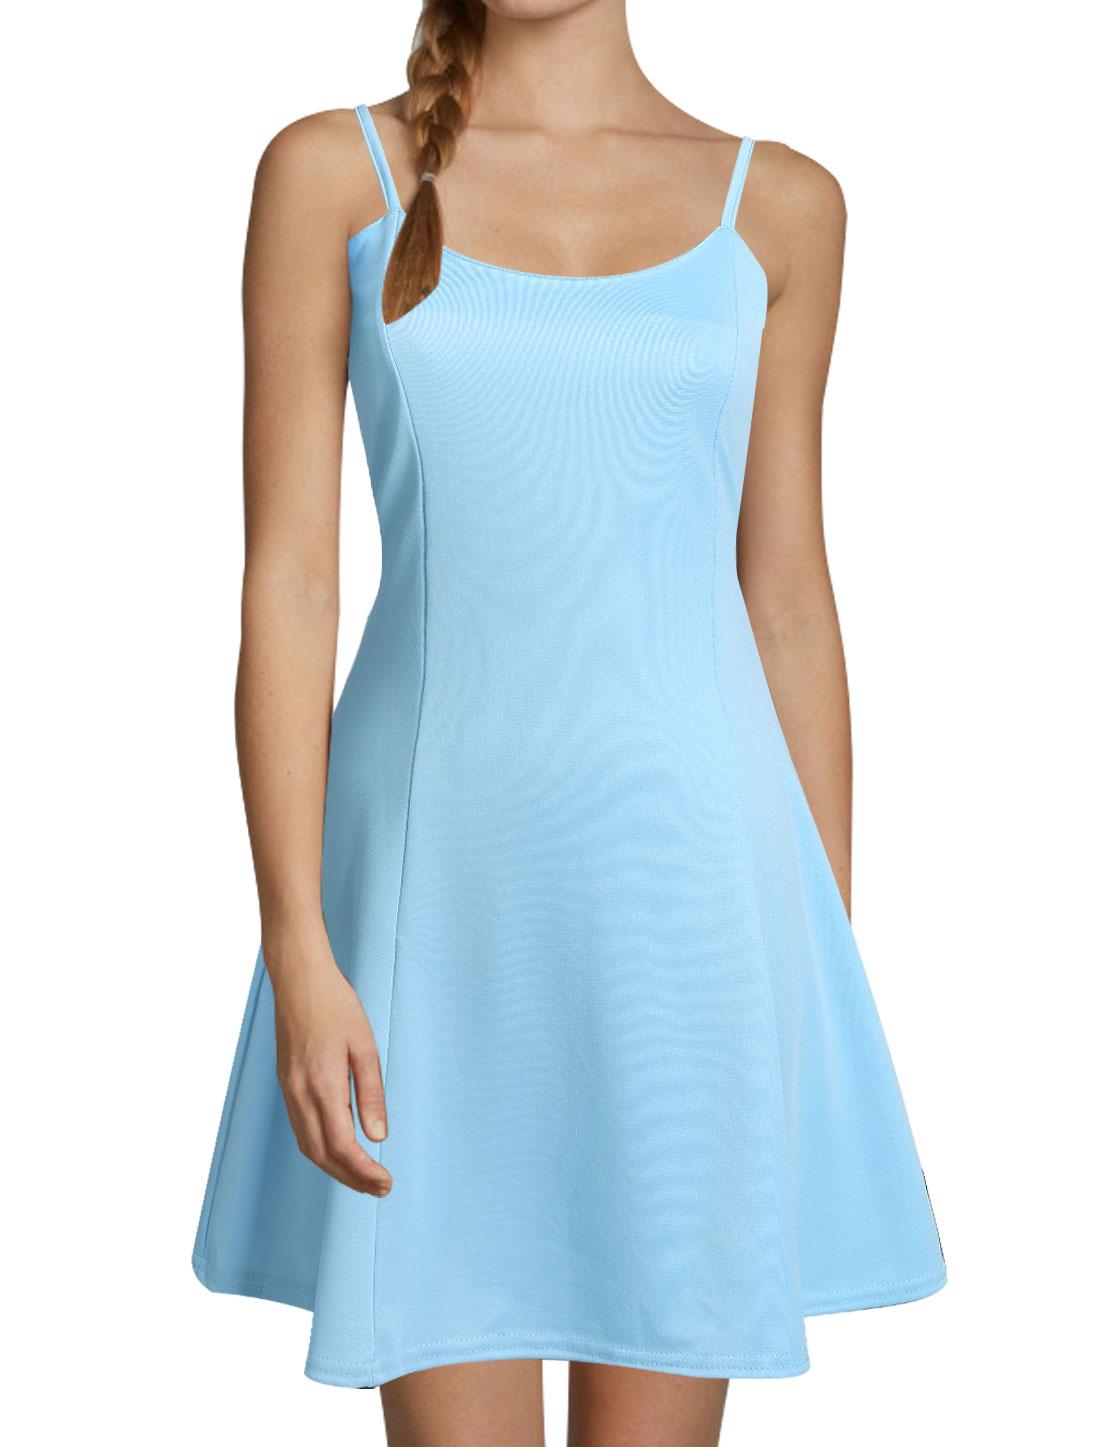 Ladies Scoop Neck Sleeveless Unlined Casual Dresses Light Blue XS